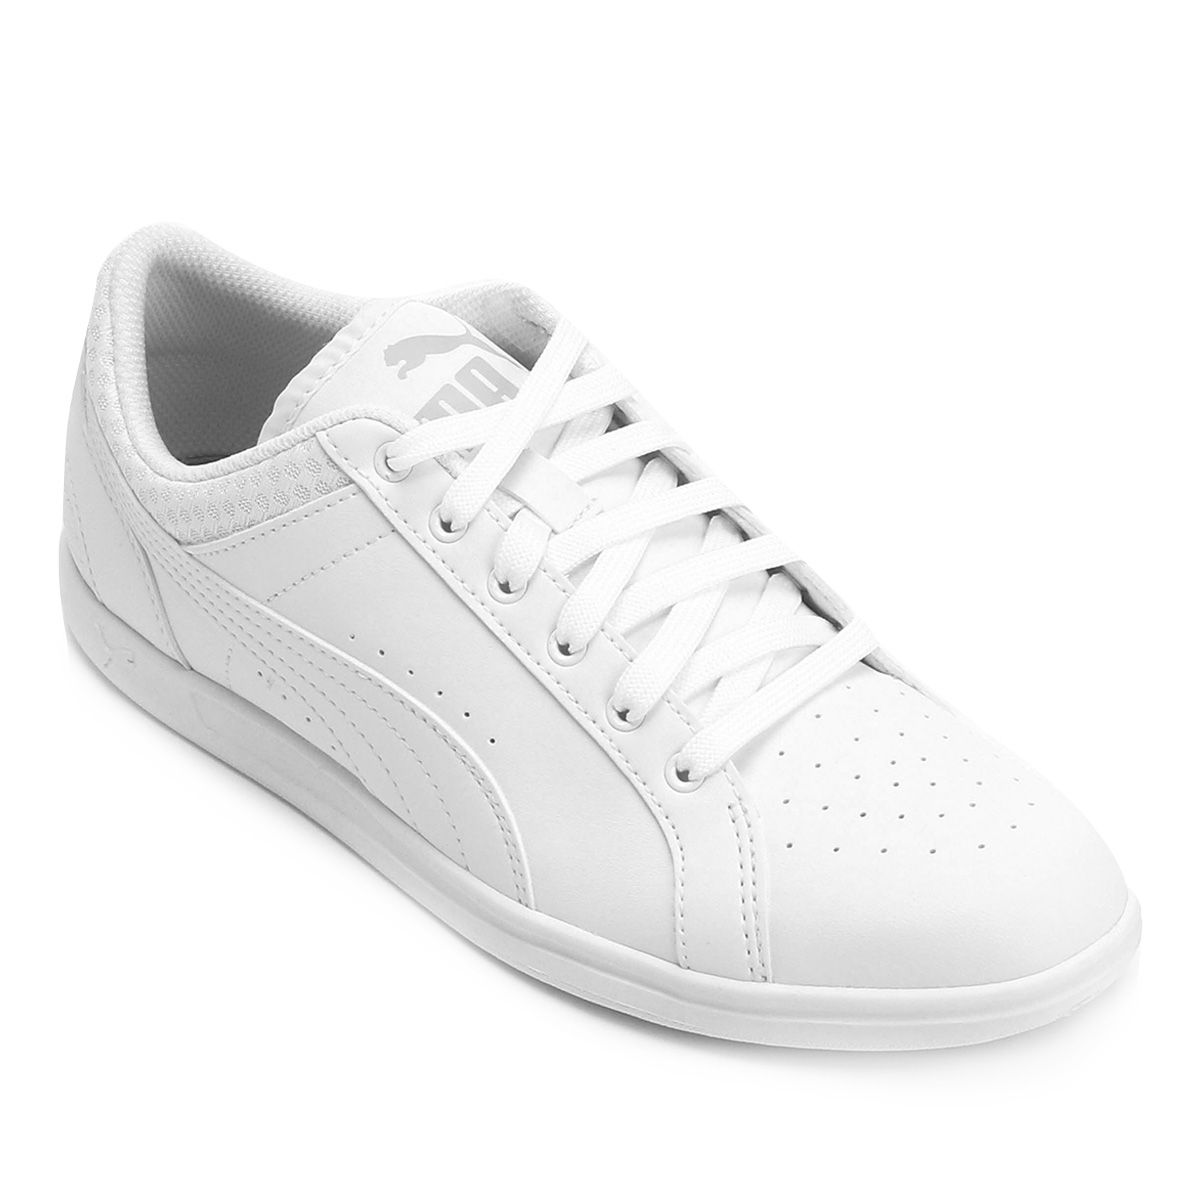 Tênis Puma Ikaz Lo V2 Feminino - Branco Puma Sneakers 697a049a6